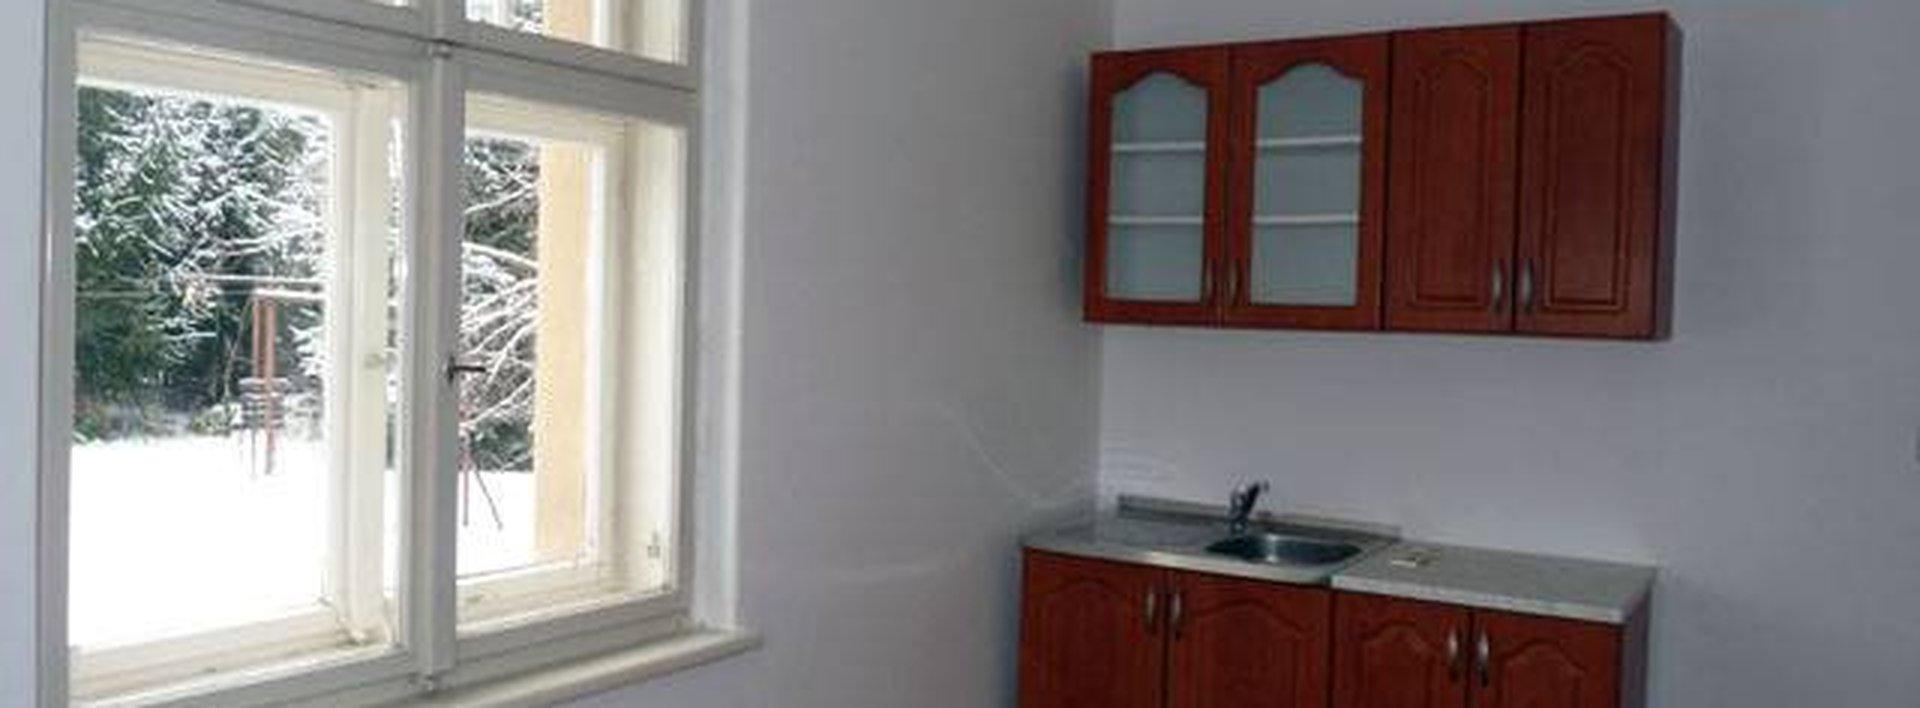 Pronájem, byt garsonka, 22m², Ev.č.: N45831